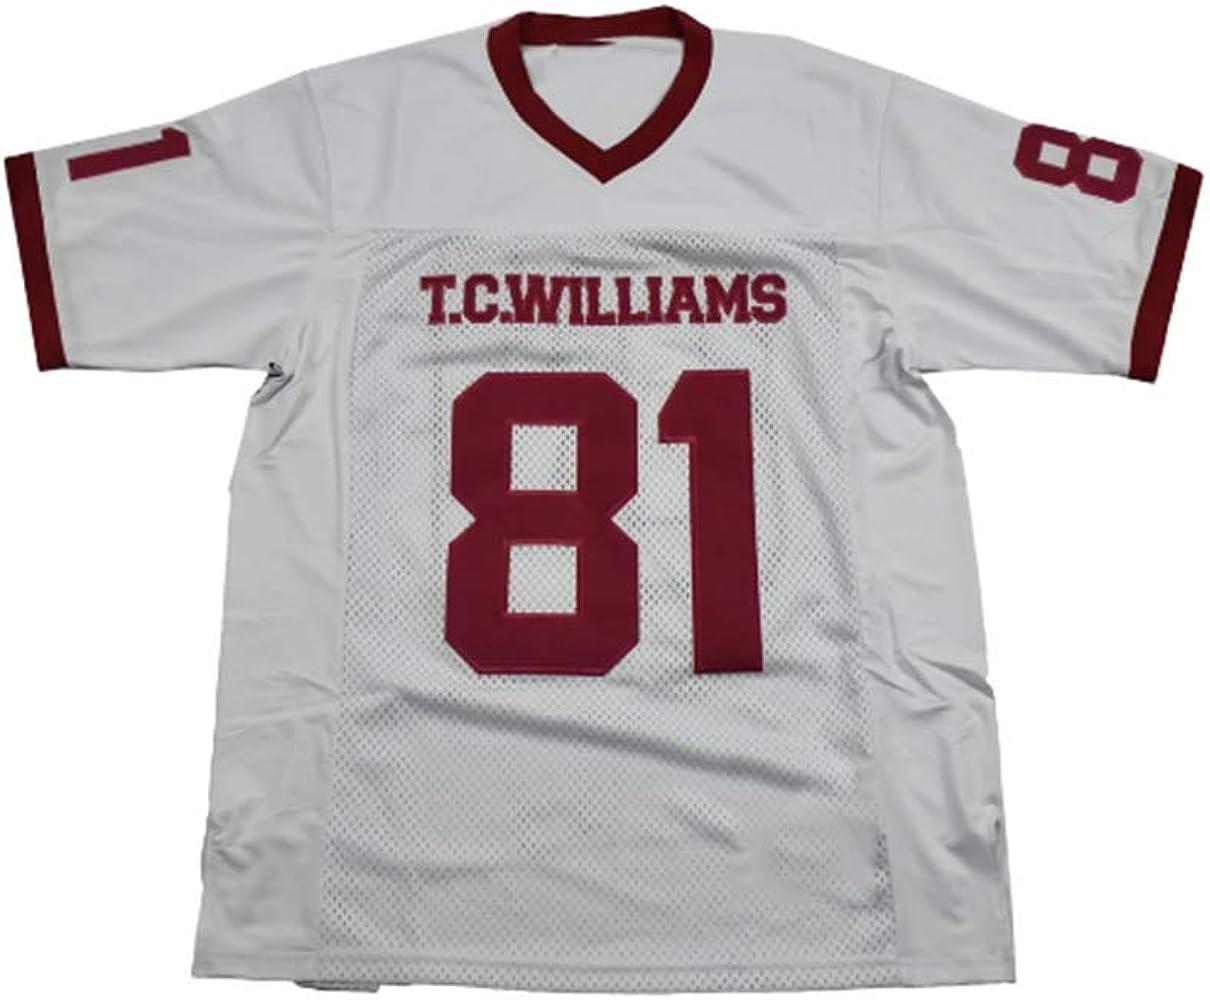 Julius Campbell #81 Custom White Men's Movie Football Jersey